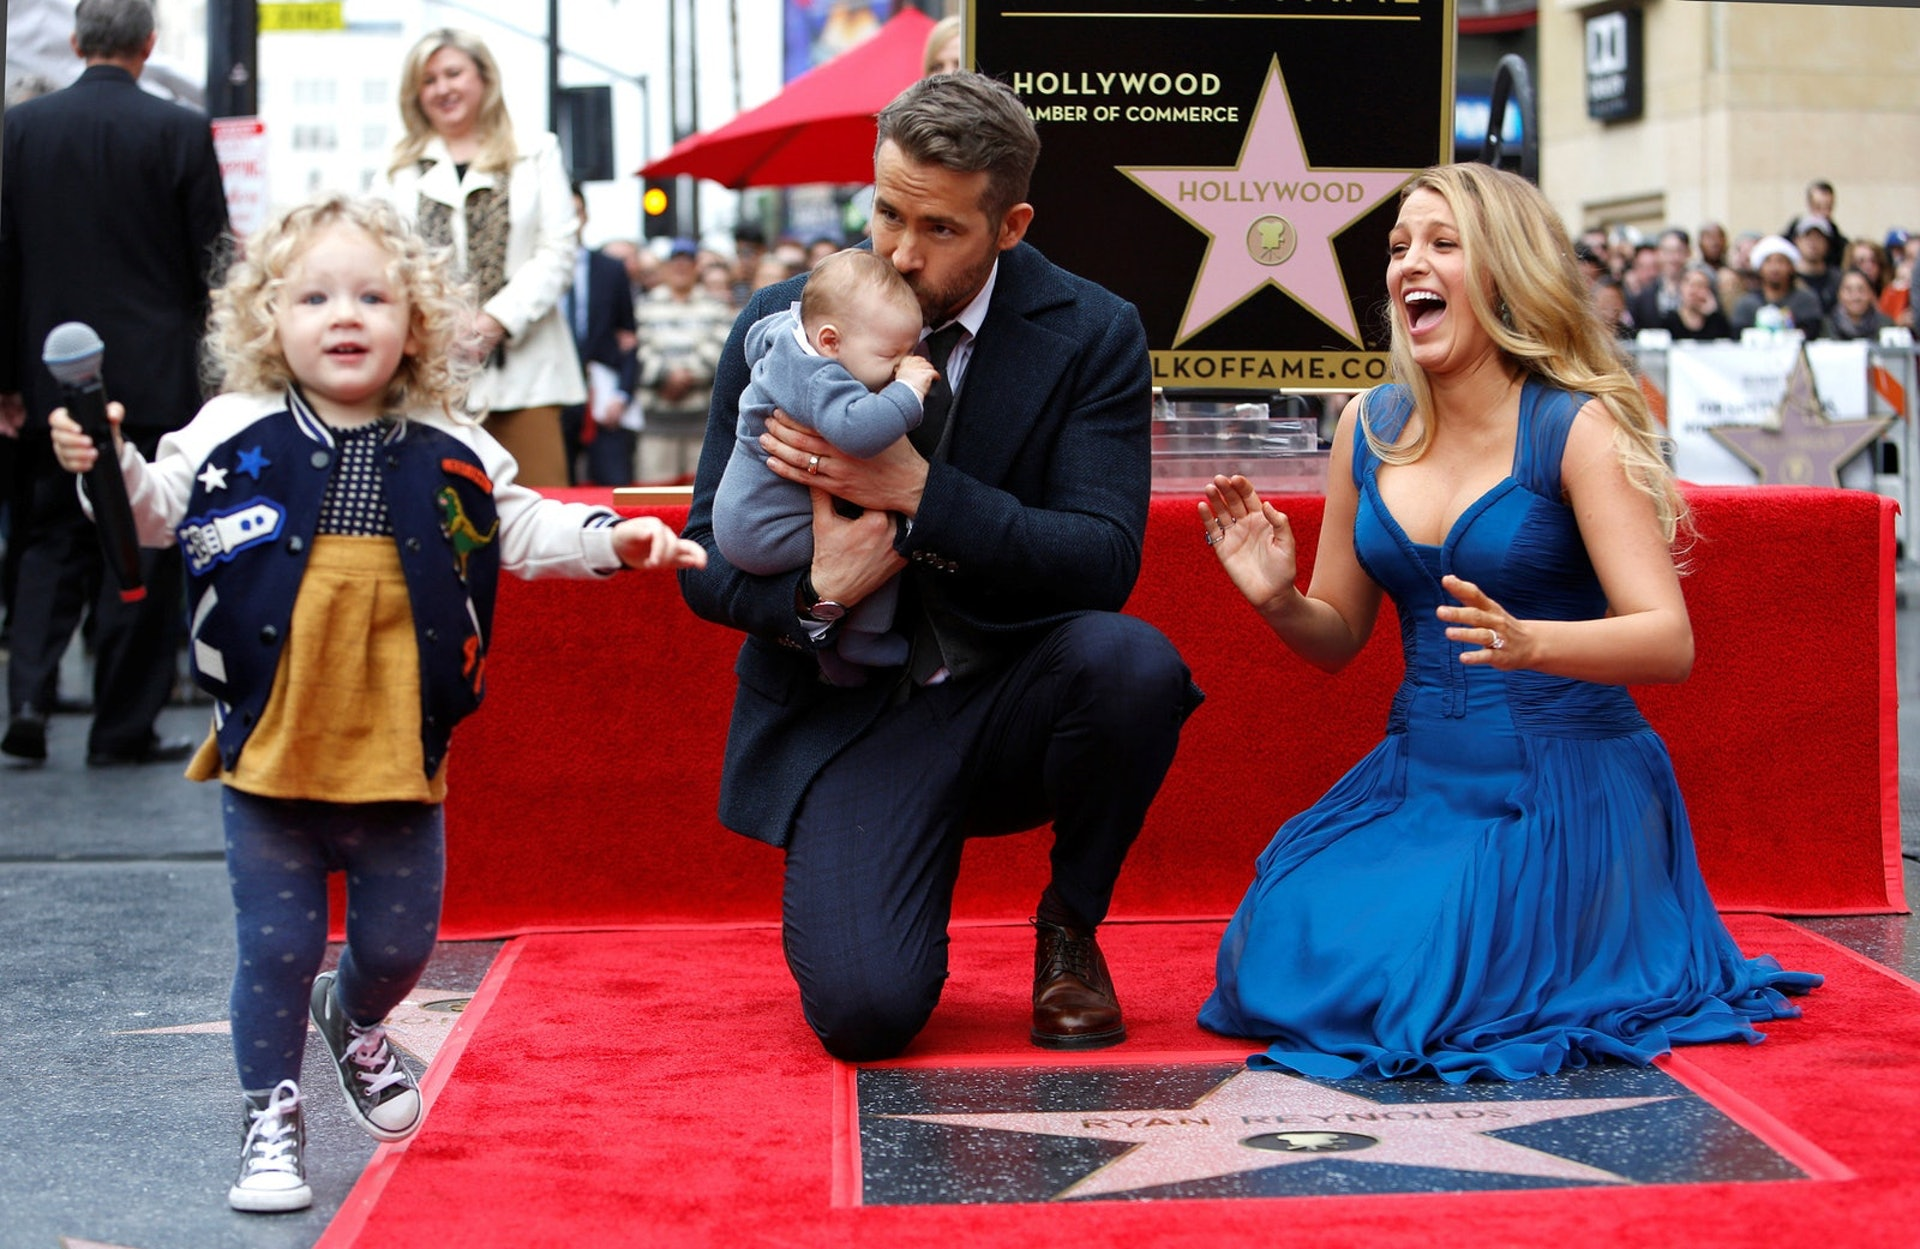 Blake與Ryan之前已經有兩個寶貝女,兩人即將迎來第三個小朋友,相當幸福!(Getty Images)